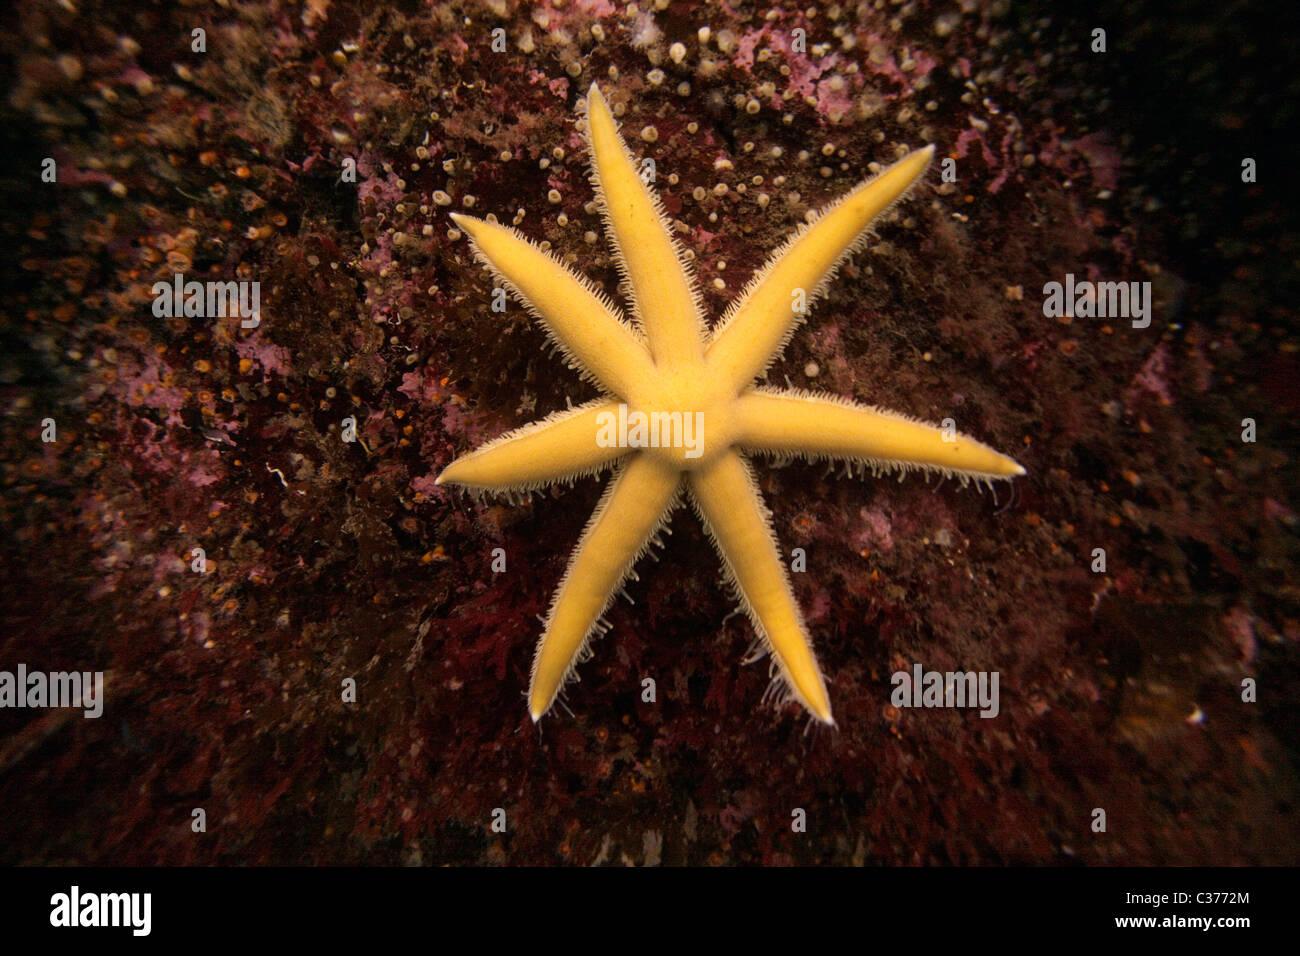 seven armed starfish. (Luidia ciliaris). Outer Hebrides, Scotland - Stock Image